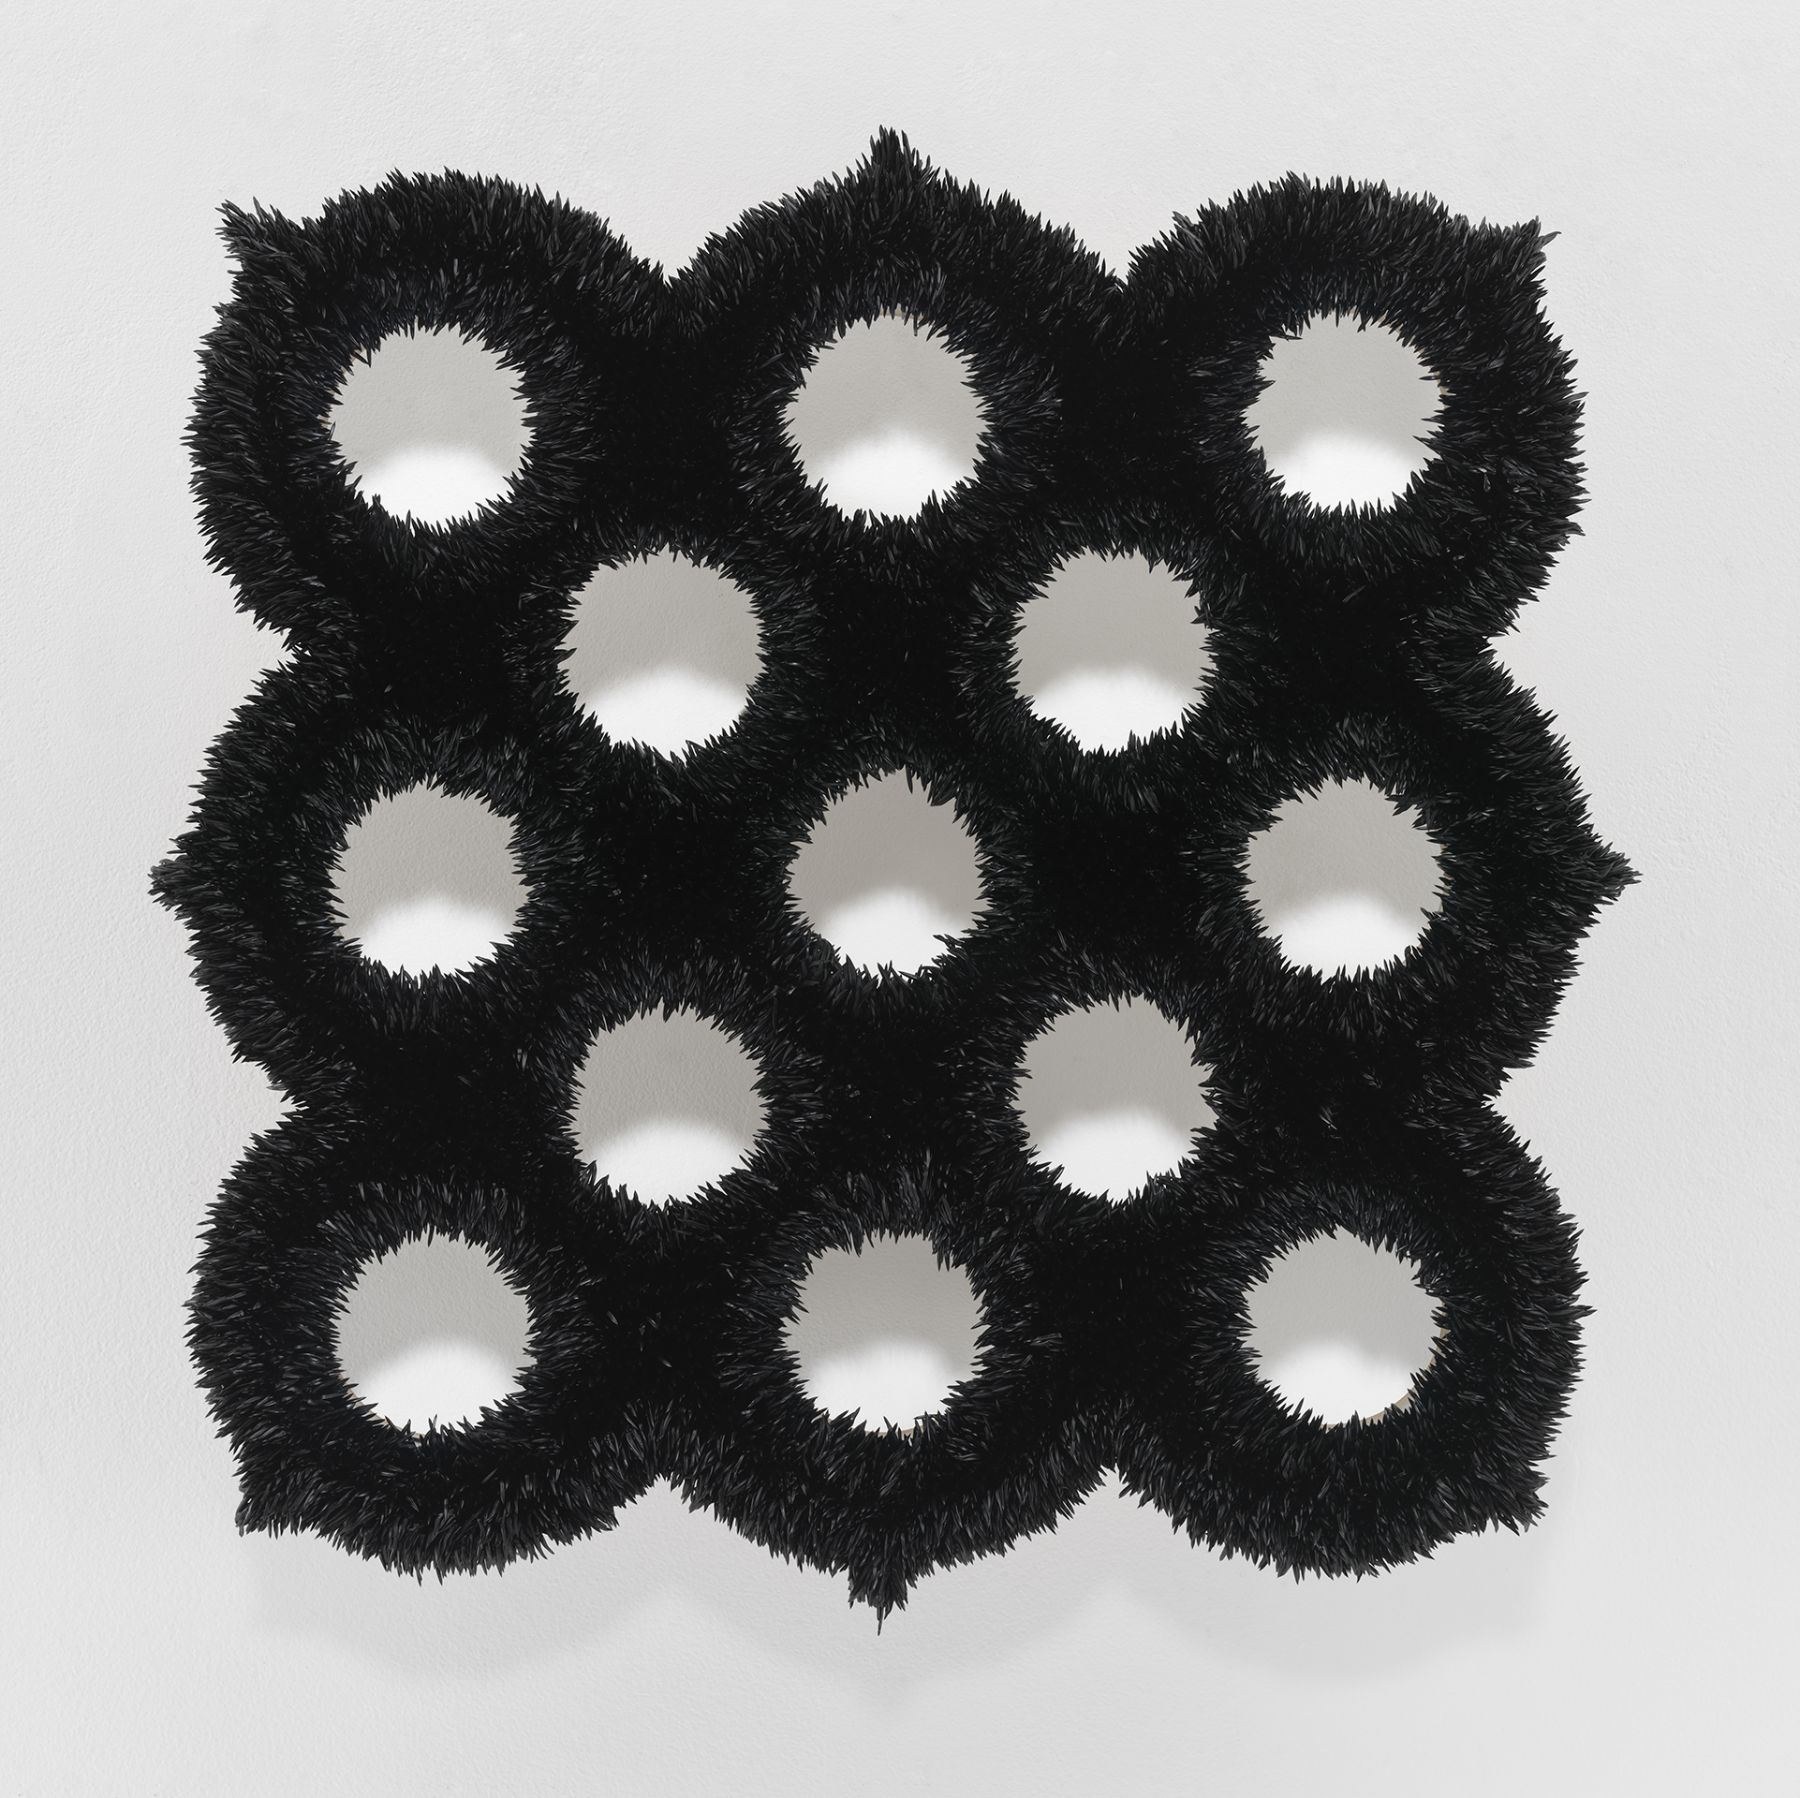 Donald Moffett, Lot 052015 (exo-spore 5, ivory black), 2015